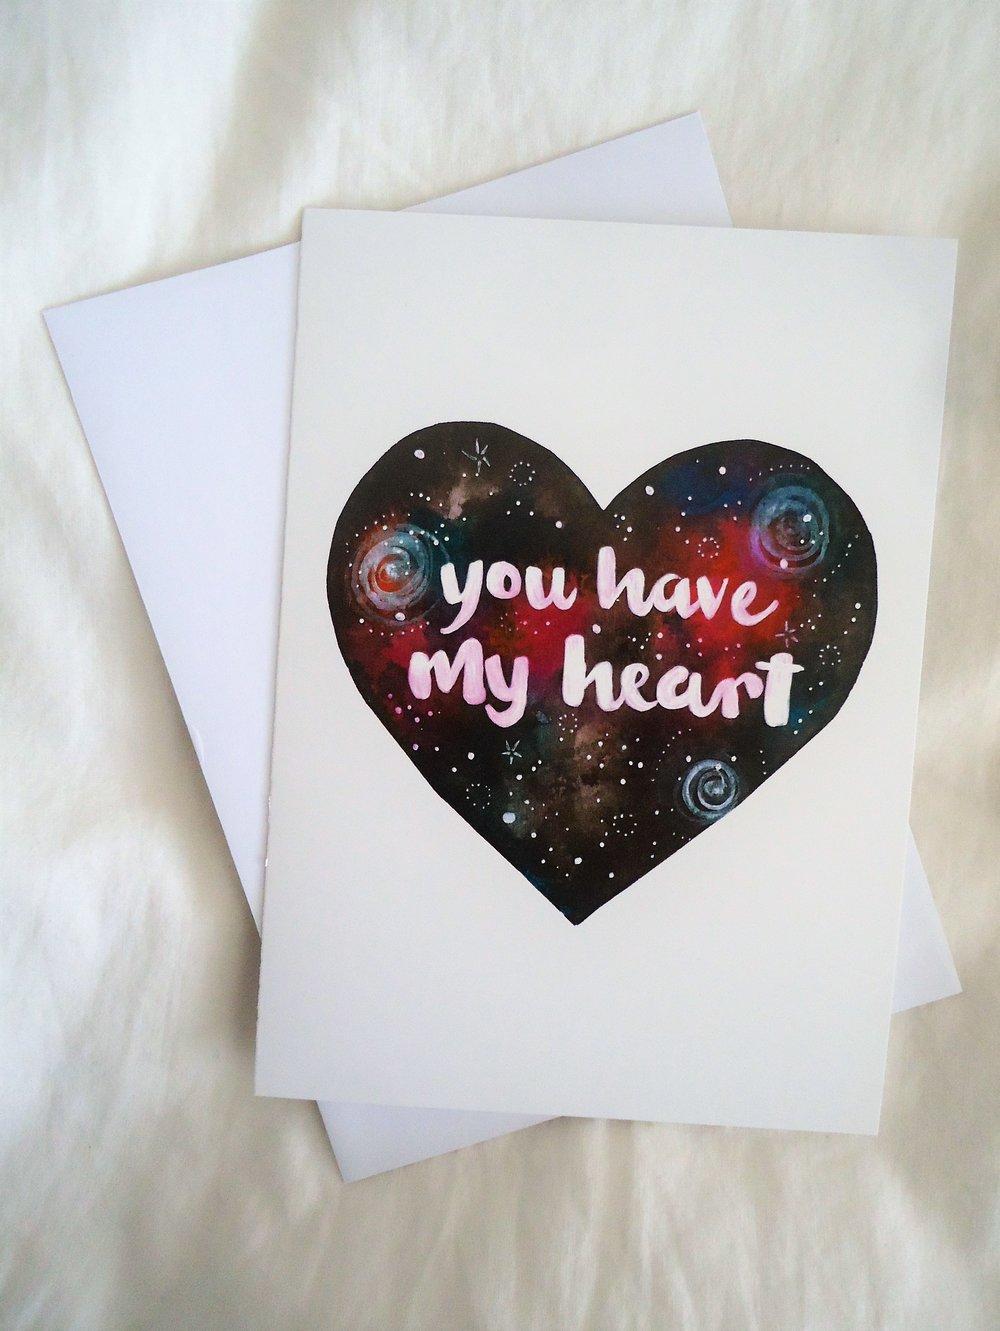 ValentinesHearts (2).JPG